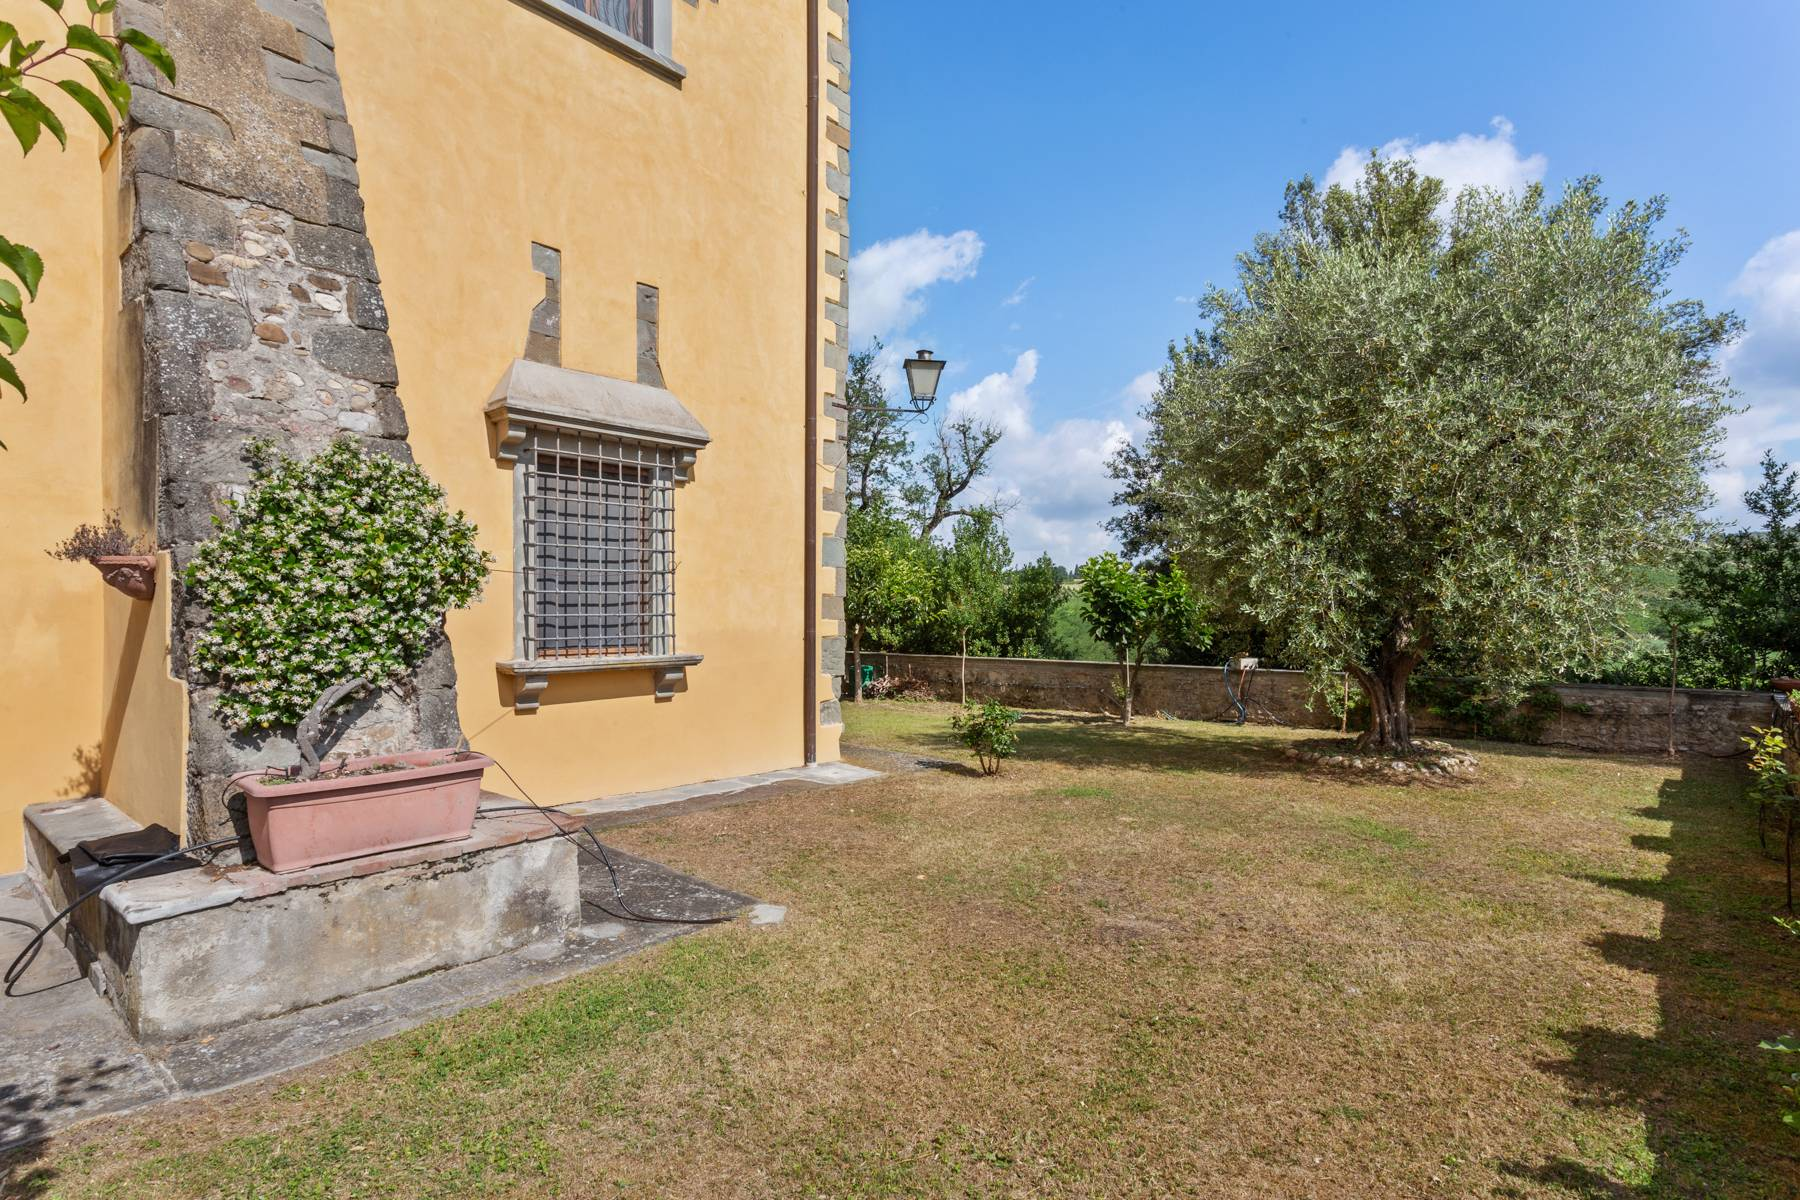 Appartamento in Vendita a Scandicci: 5 locali, 170 mq - Foto 2